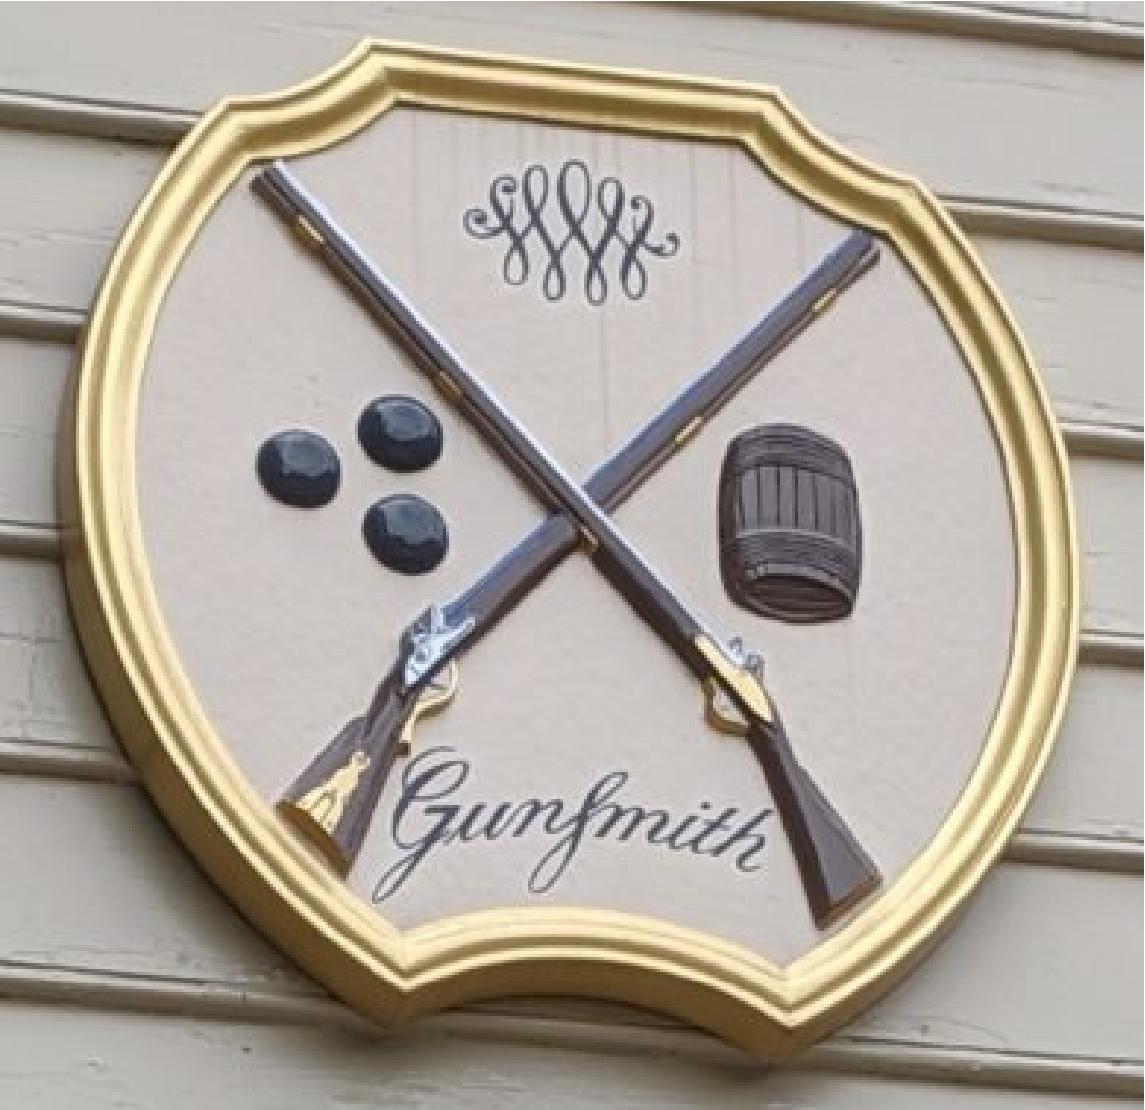 Colonial Williamsburg – Gunsmith Shop